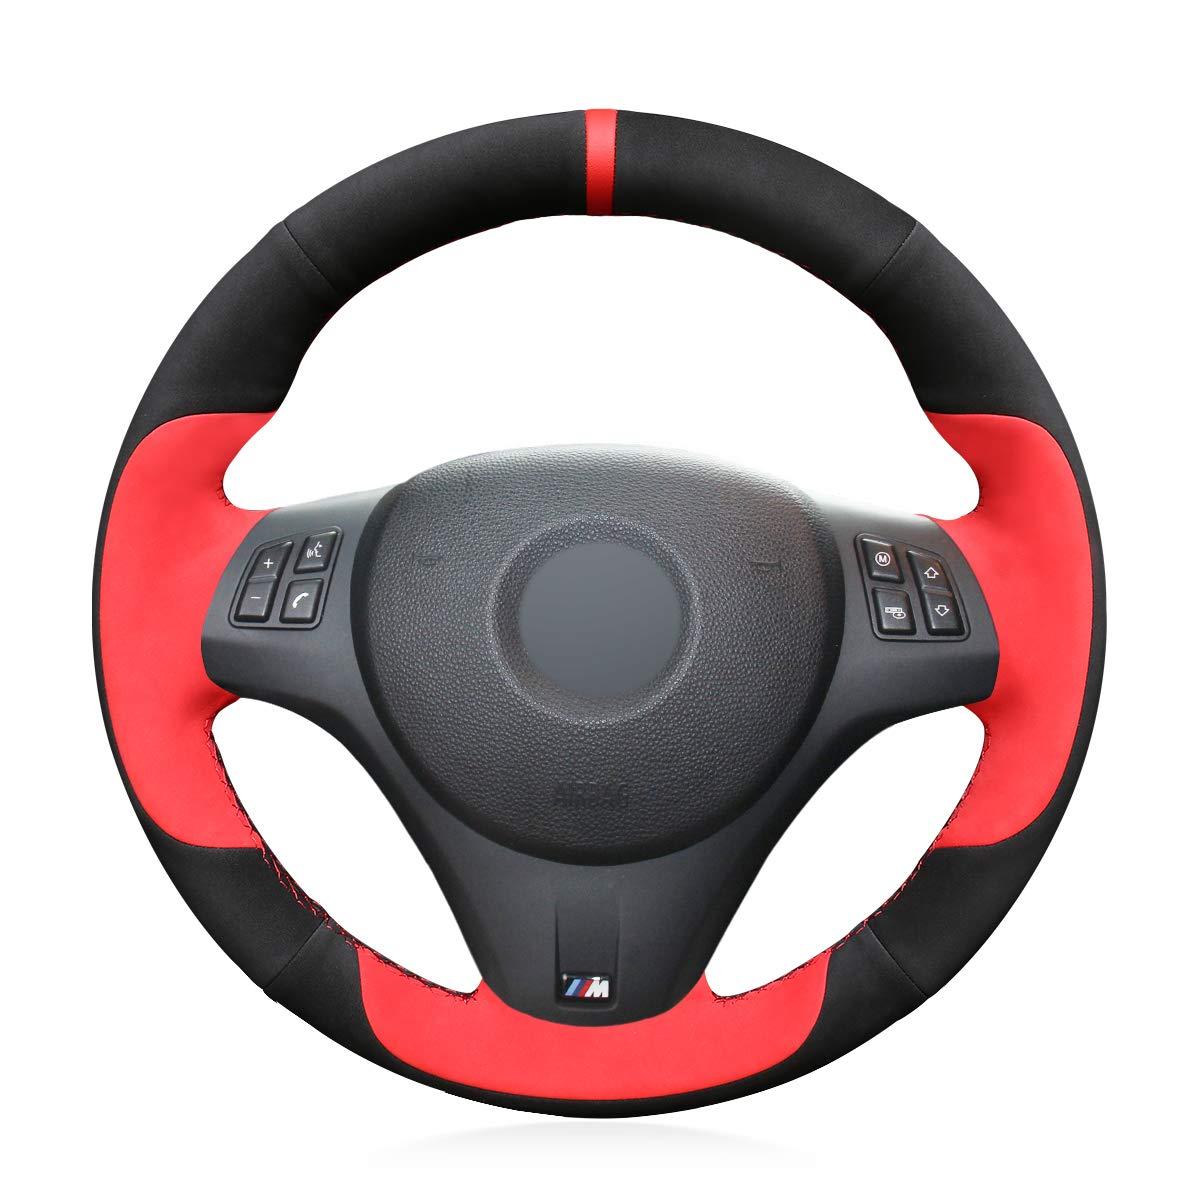 MEWANT DIY Customized Hand Stitch Black Genuine Leather Black Suede Car Steering Wheel Cover for M Sport M3 E90 E91 E92 E93 E87 E81 E82 E88 X1 E84